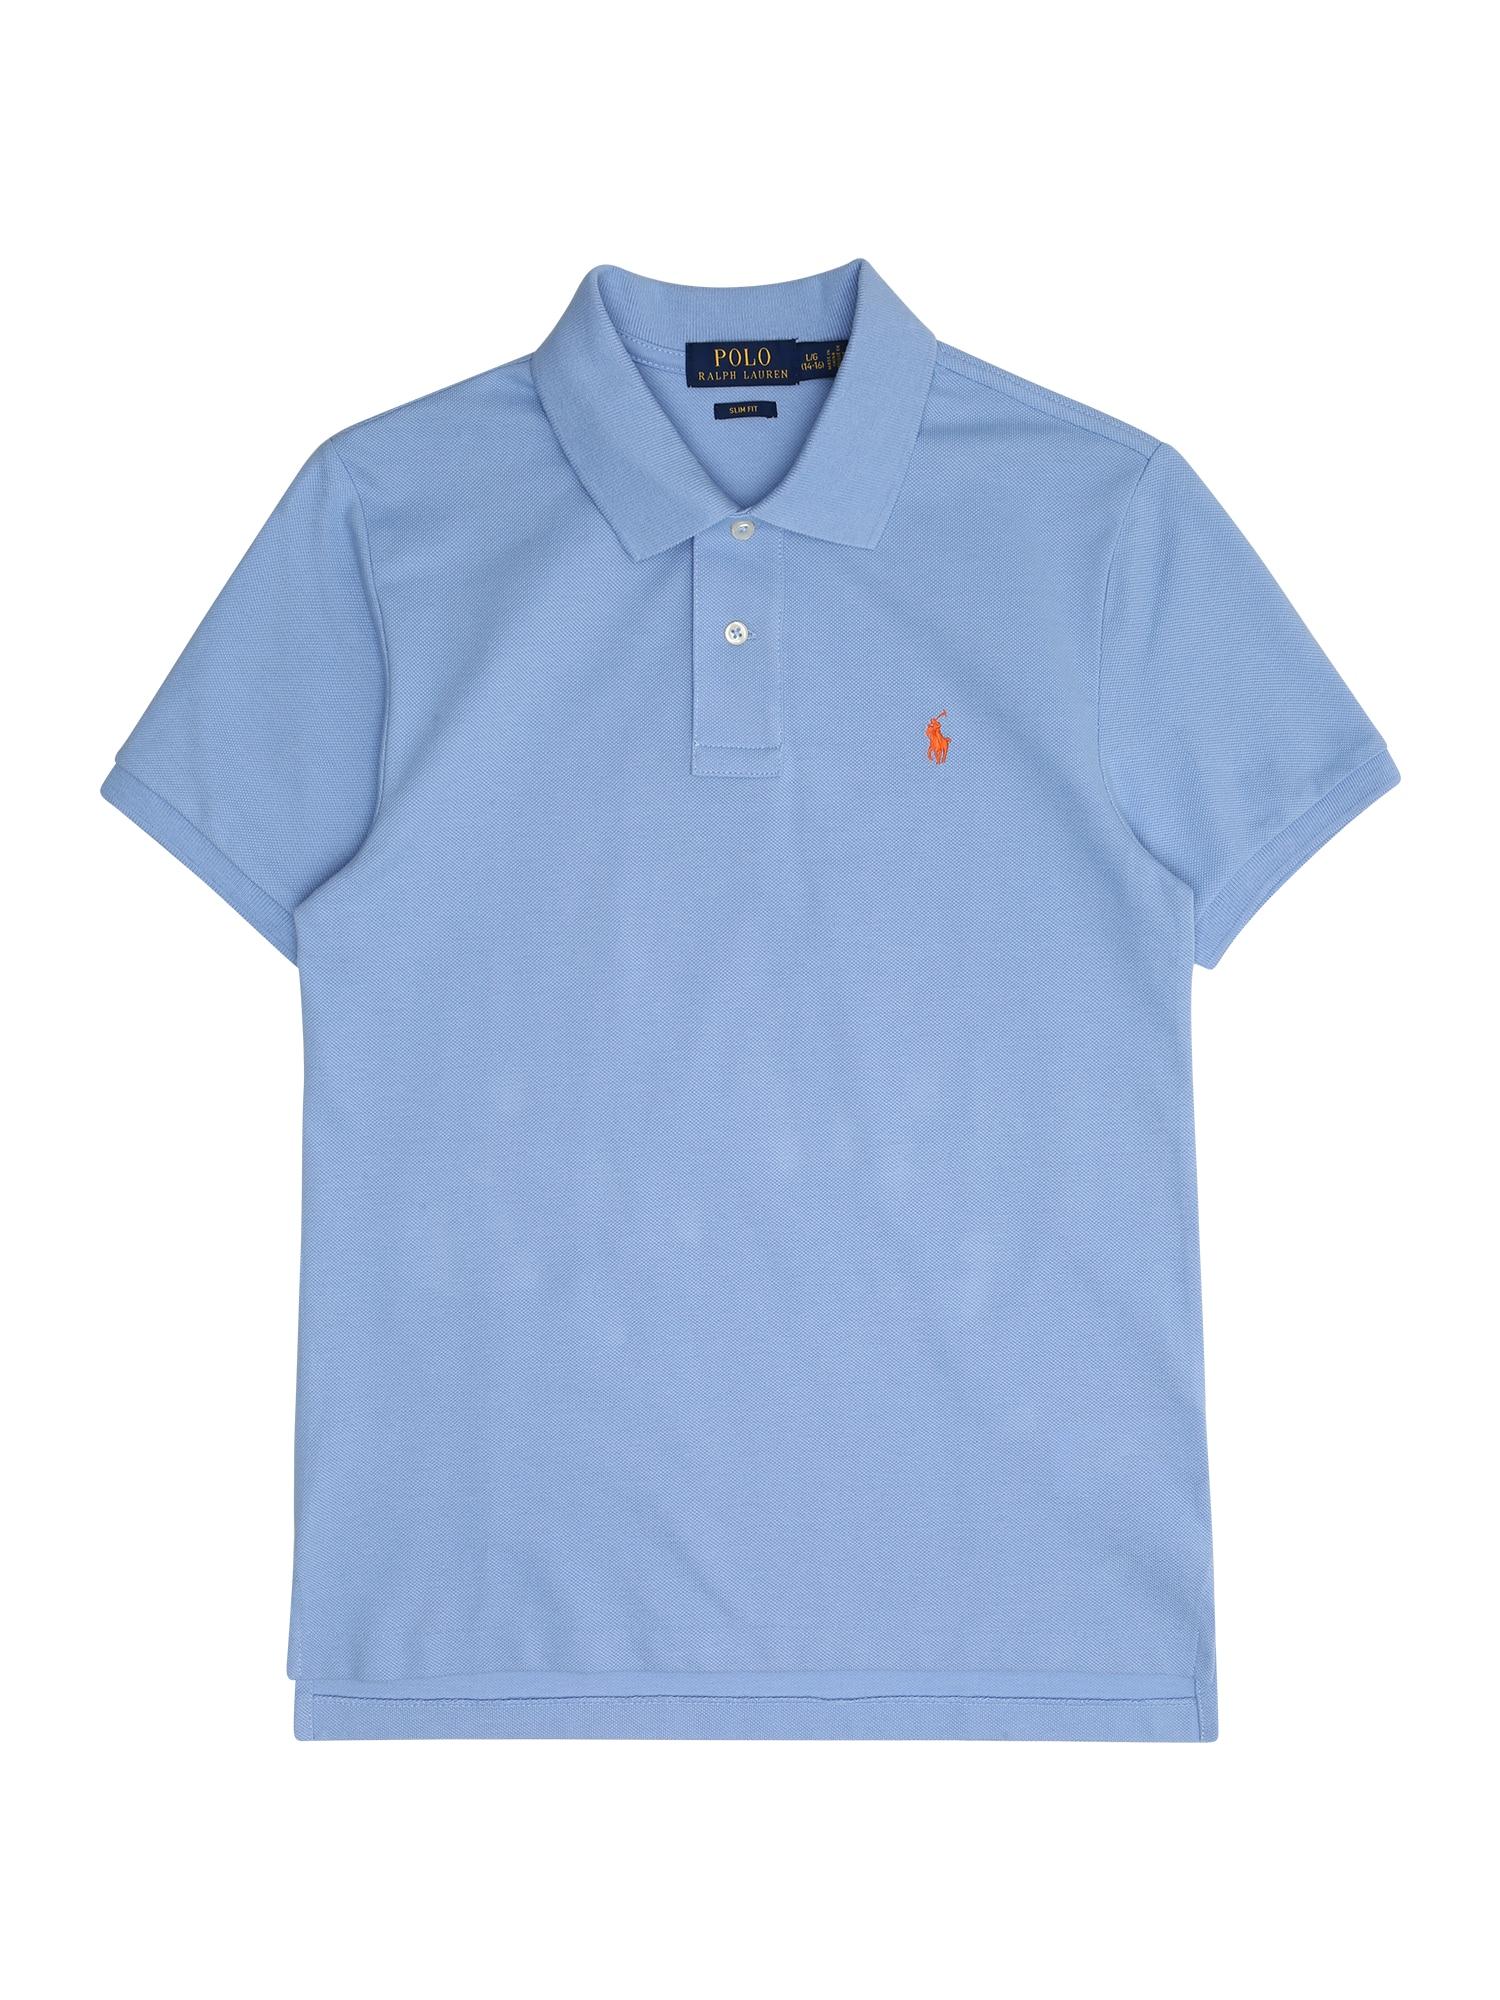 Tričko BASIC MESH nebeská modř POLO RALPH LAUREN